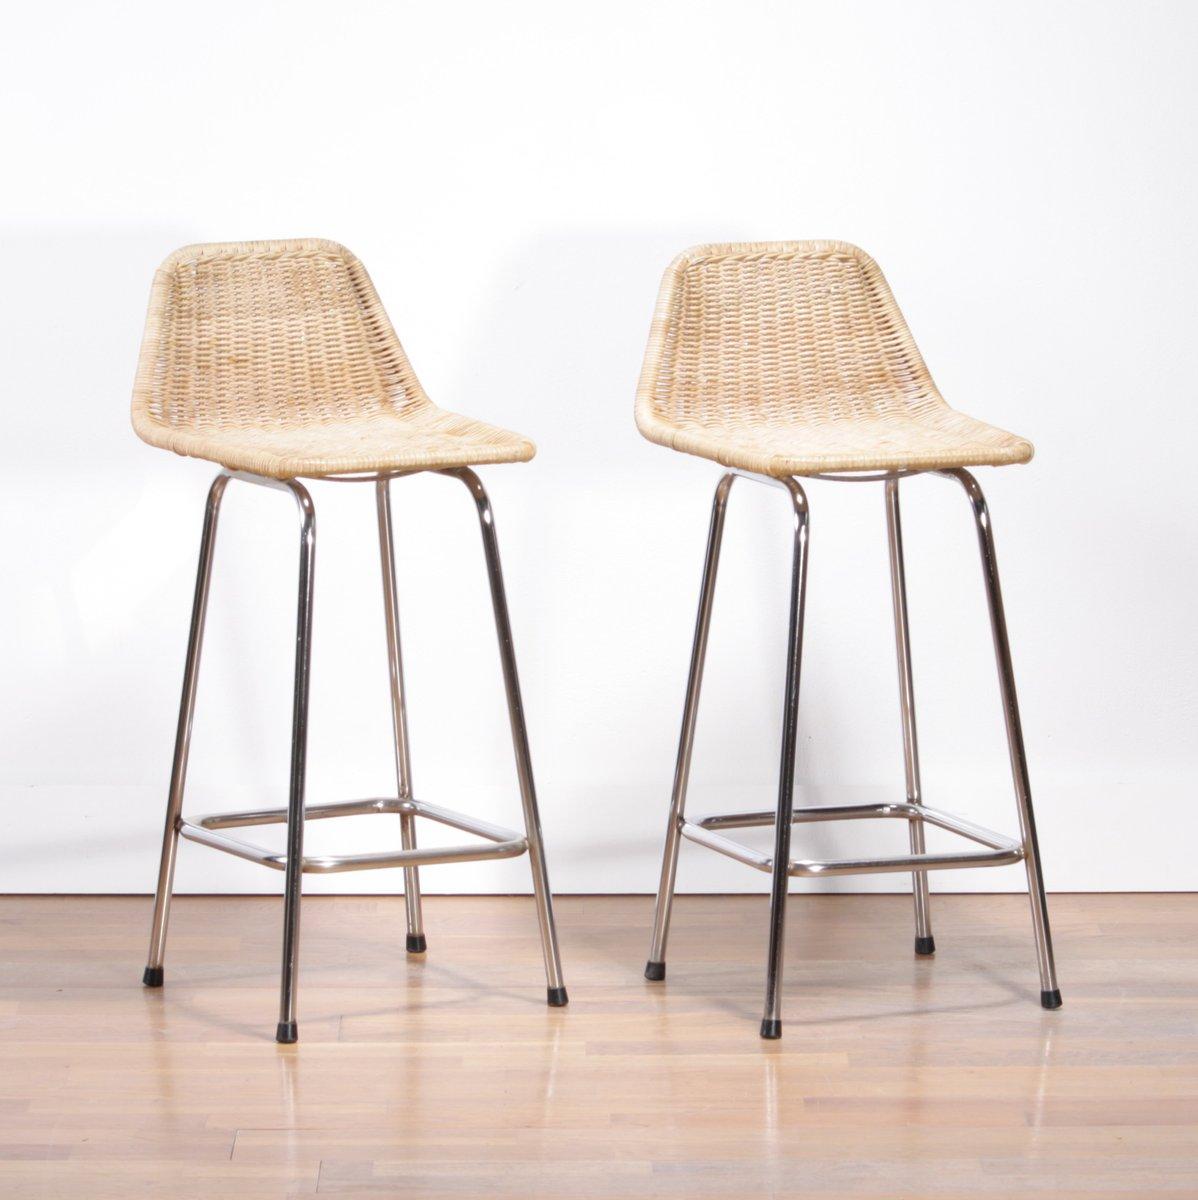 tabouret de bar rotin maison design. Black Bedroom Furniture Sets. Home Design Ideas